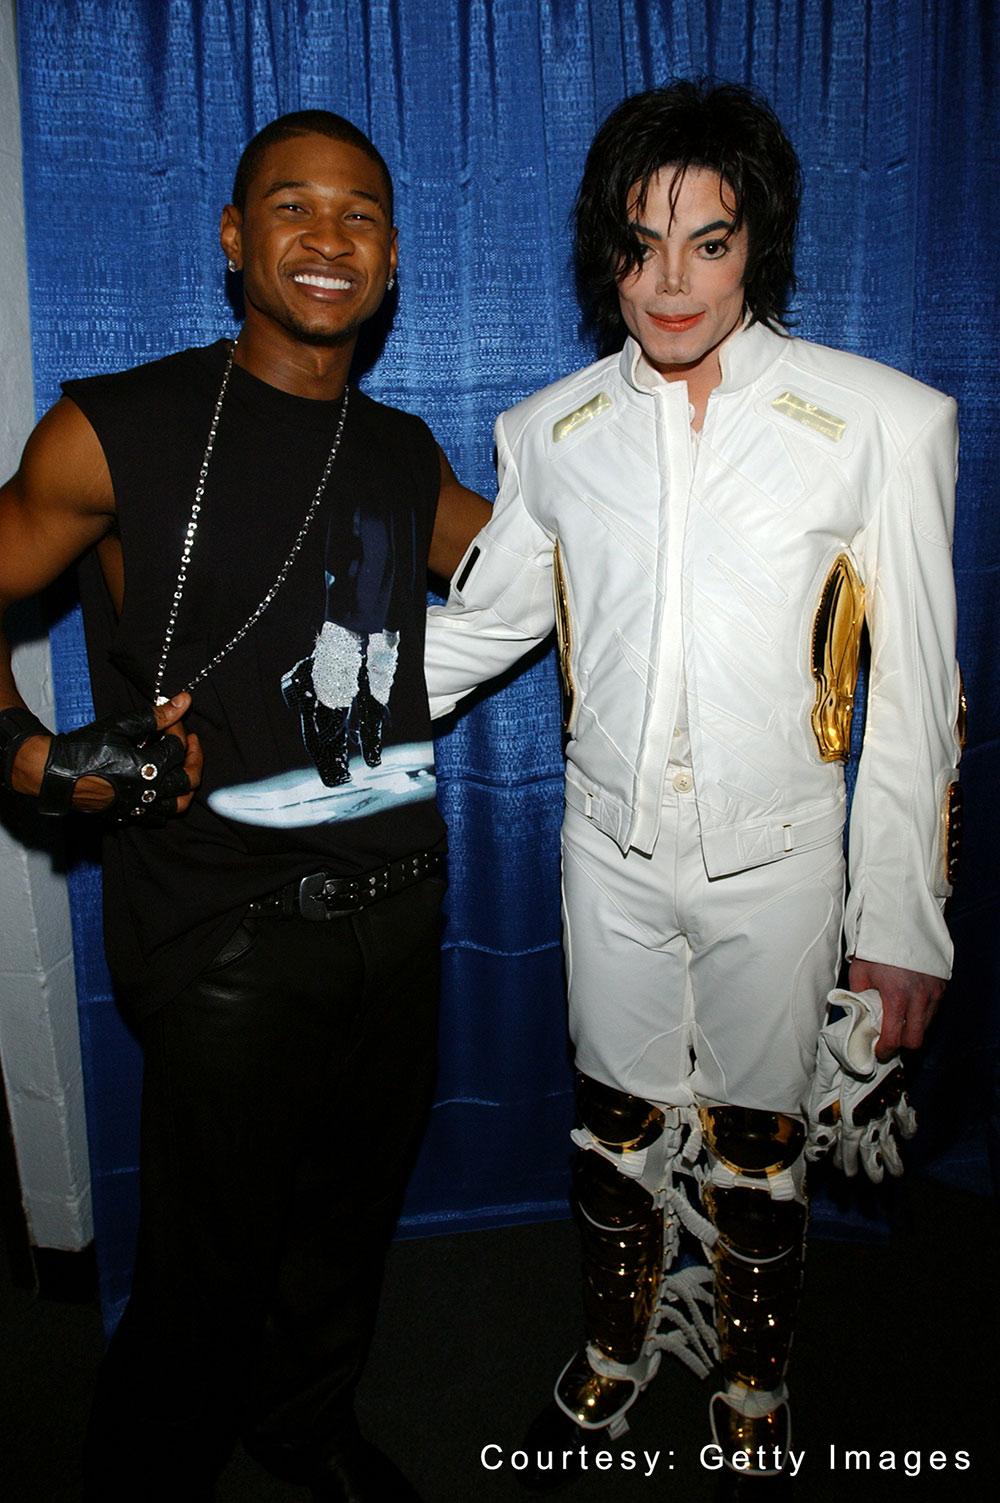 Michael and Usher at Michael Jackson: 30th Anniversary Celebration September 10, 2001